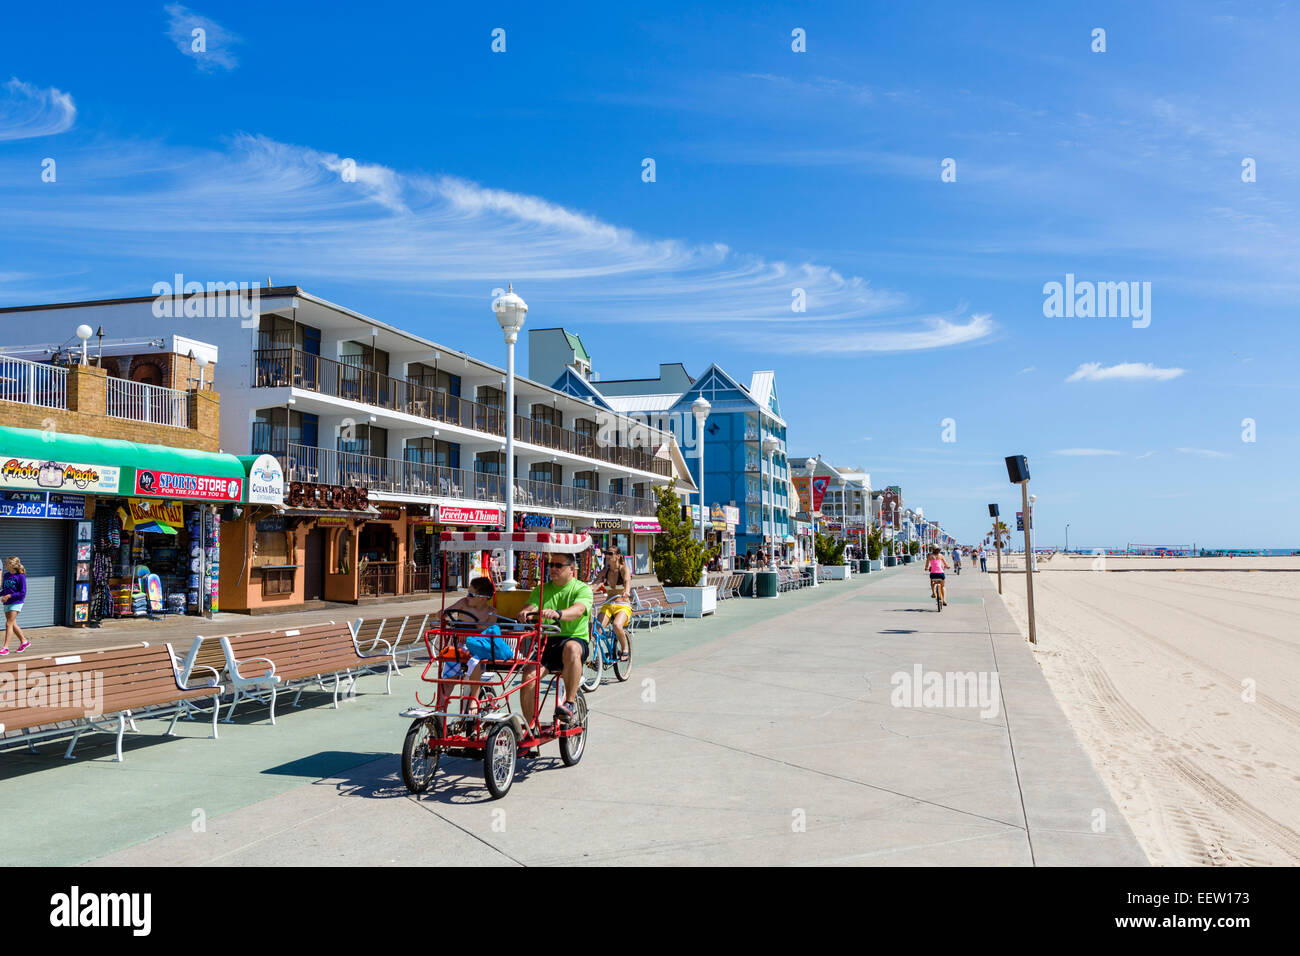 Ocean City Maryland datant